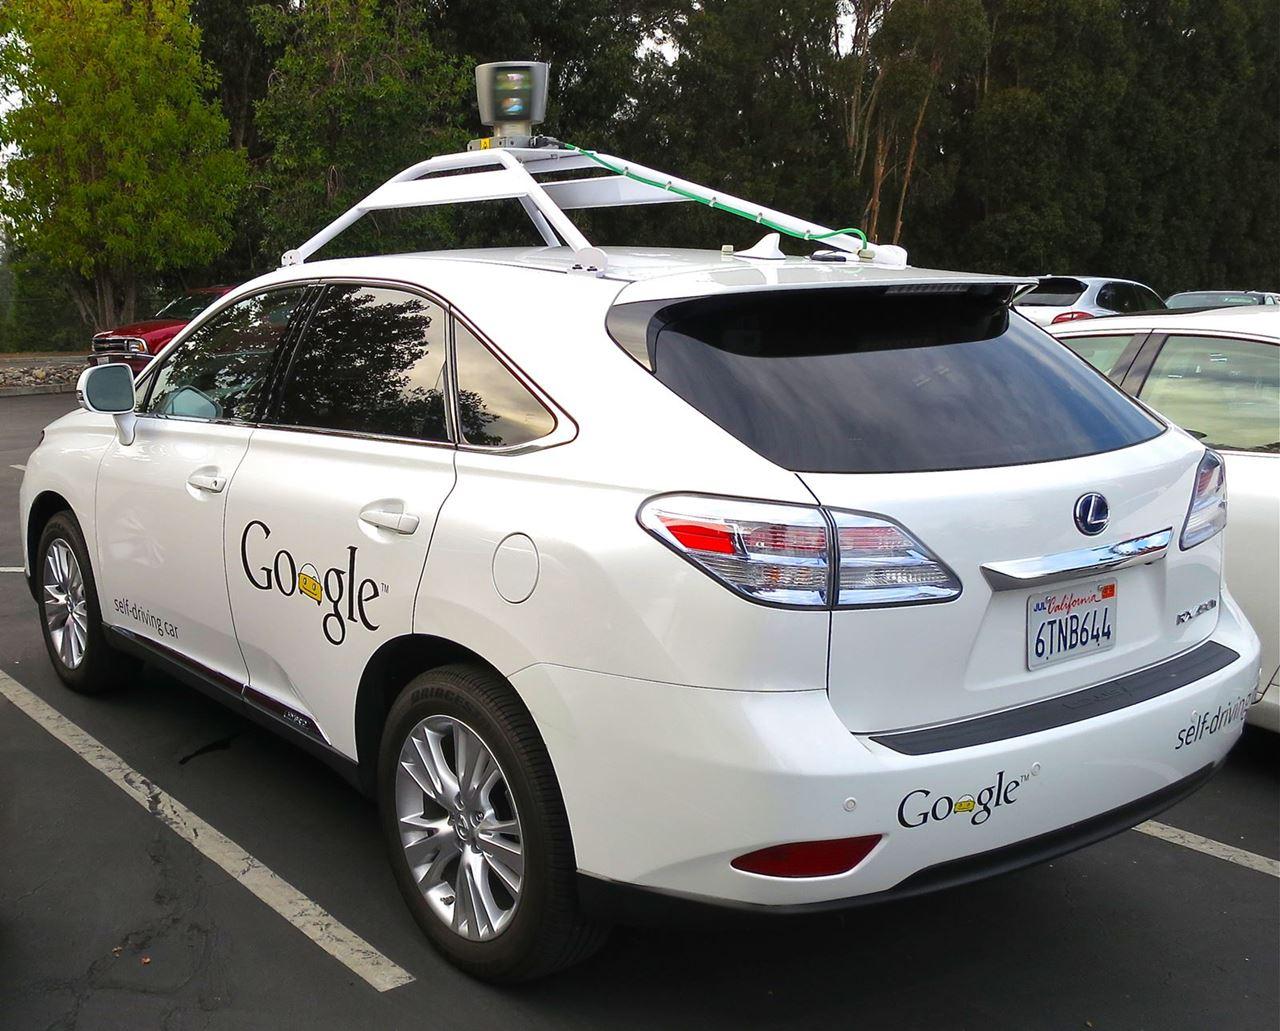 Google Self Driving Car Lexus RX 450h